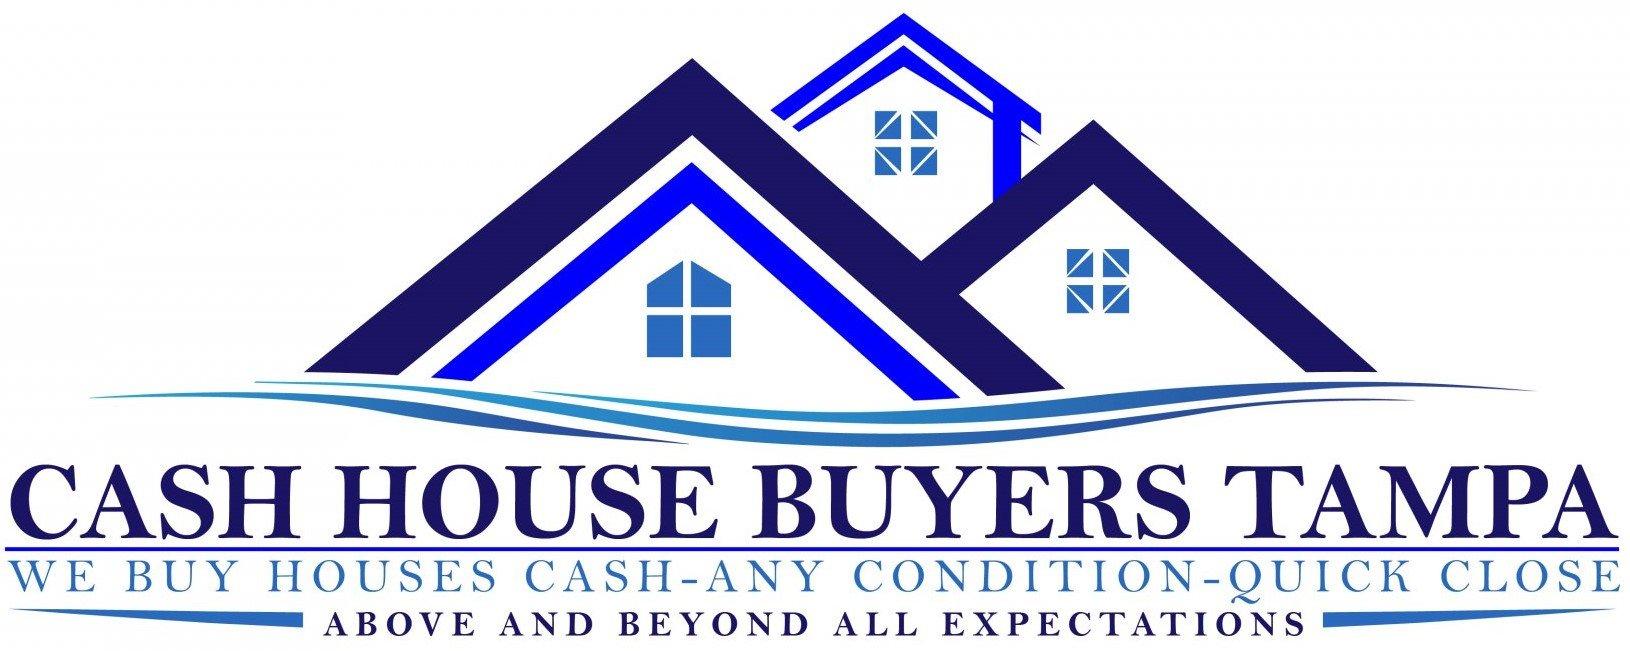 Cash House Buyers Tampa logo